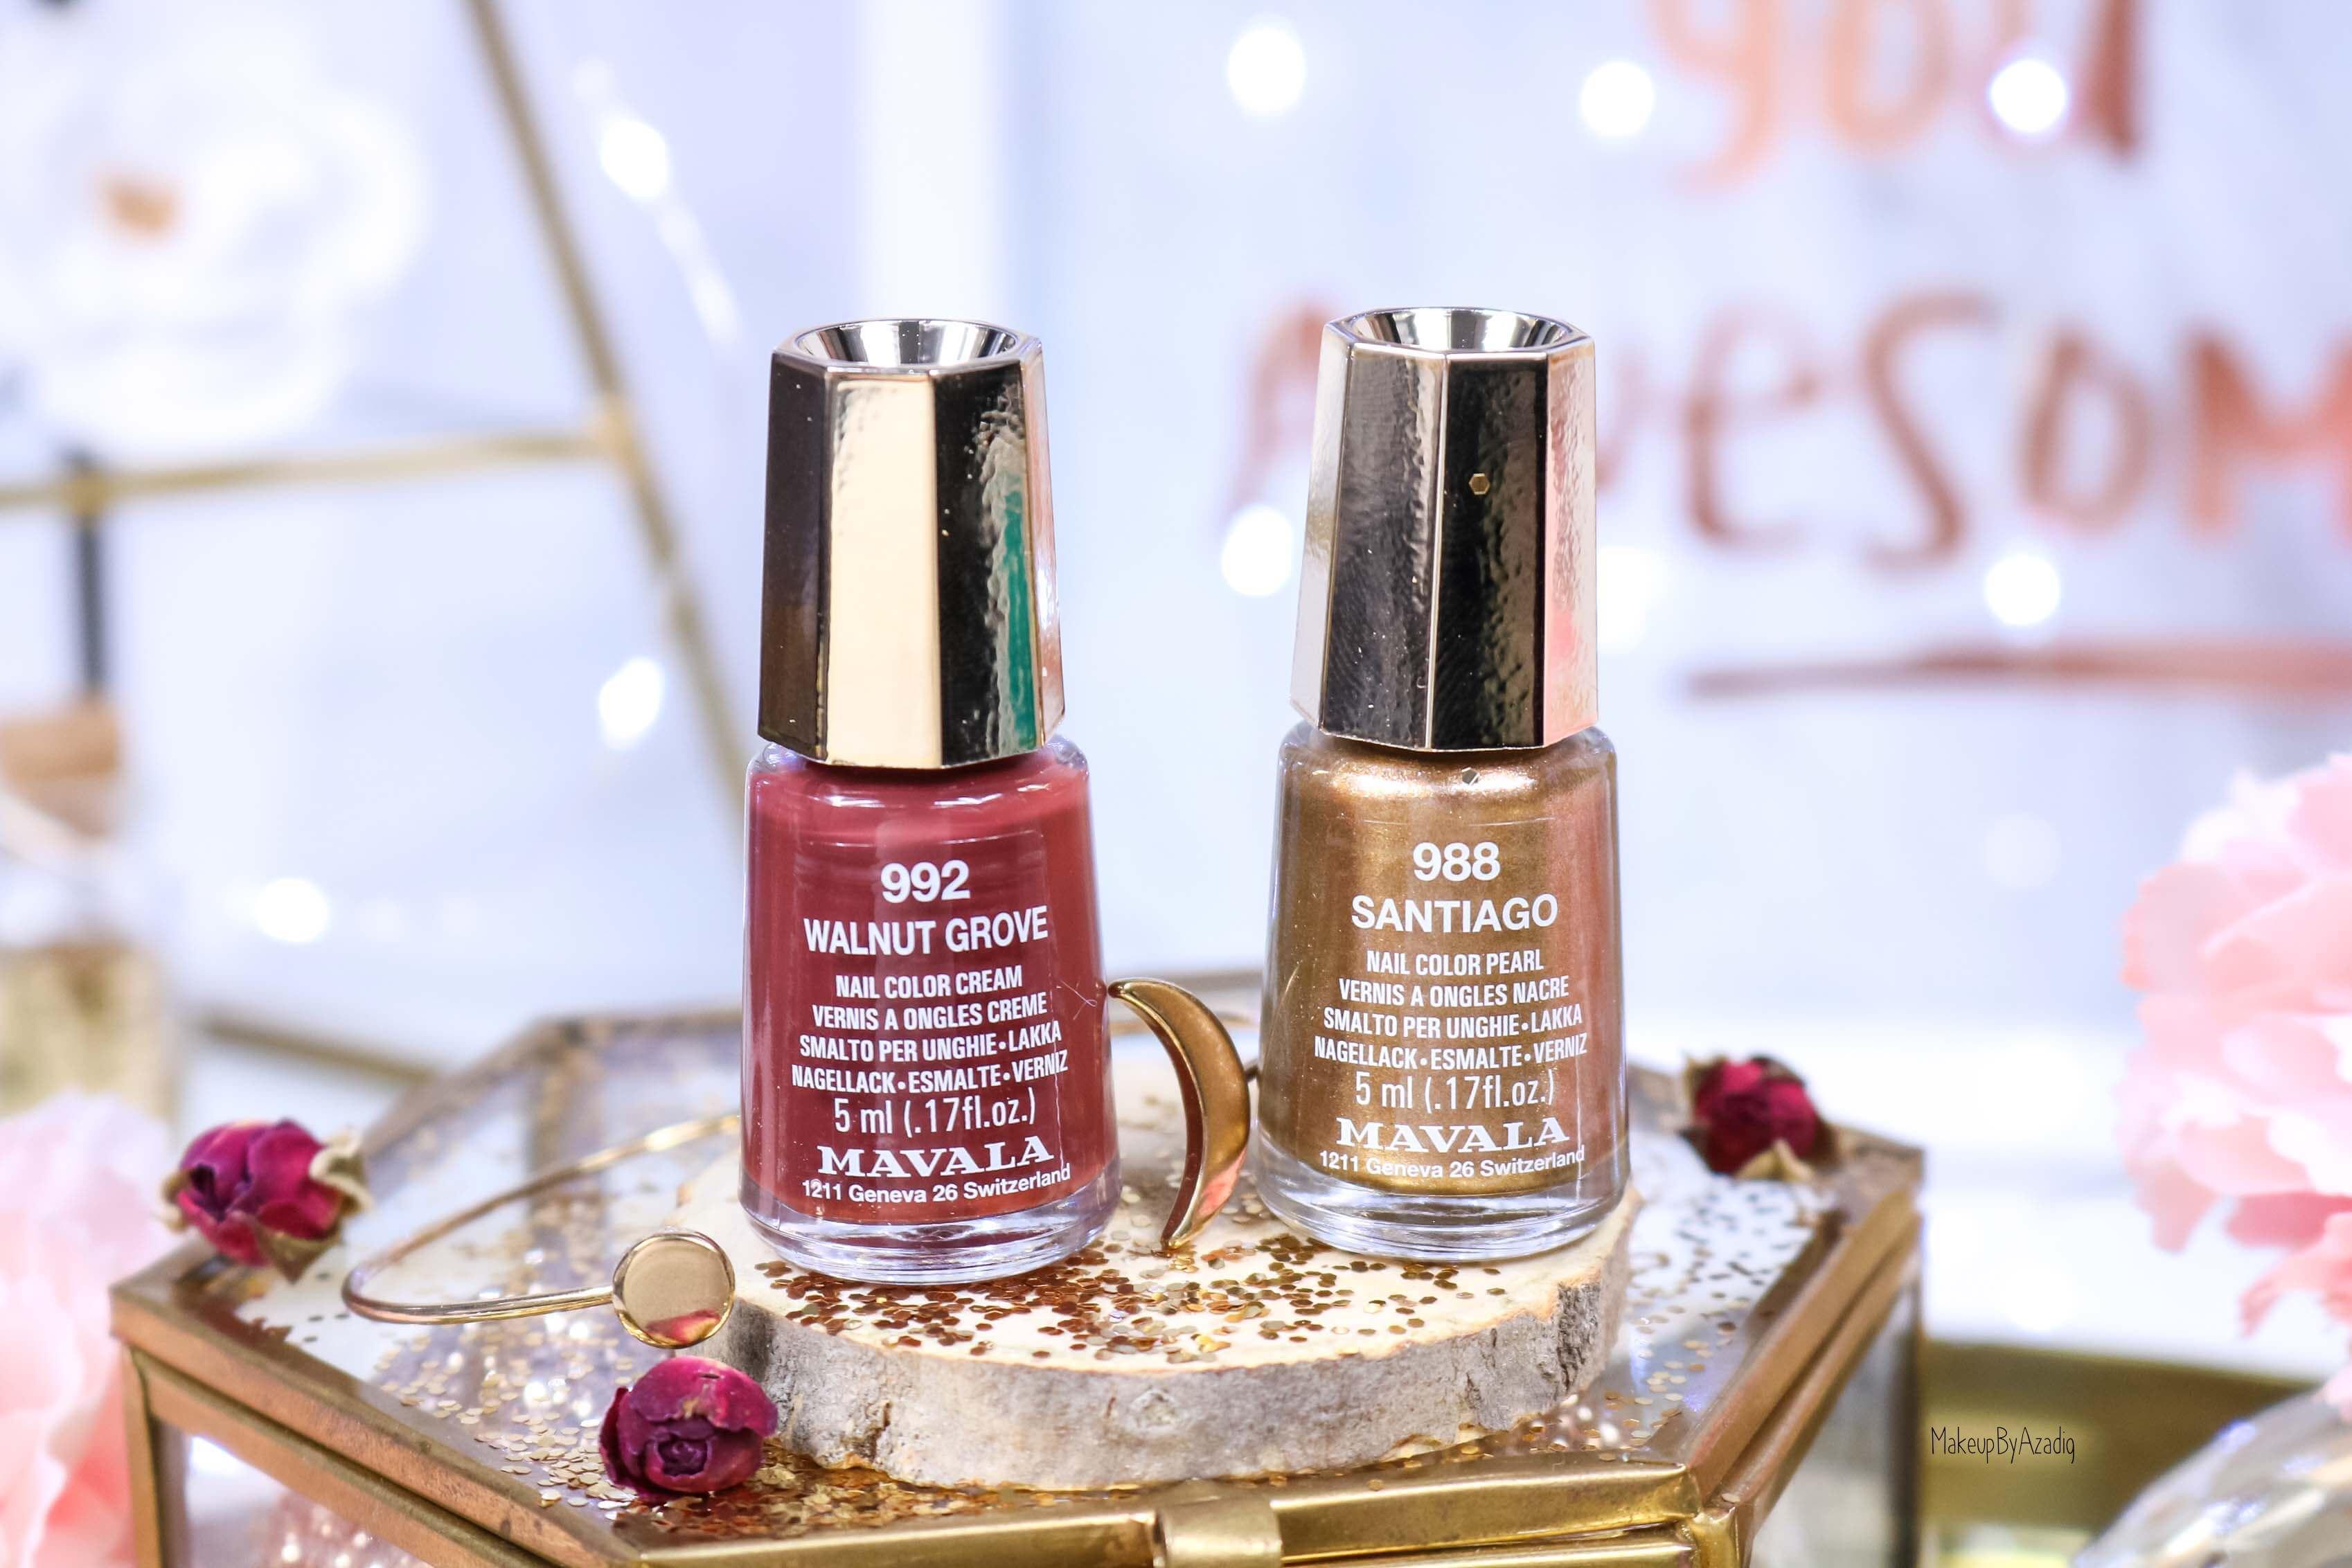 revue-collection-vernis-mavala-nails-heritage-chic-bordeaux-cuivre-metallique-gold-rouge-makeupbyazadig-swatch-avis-prix-moon